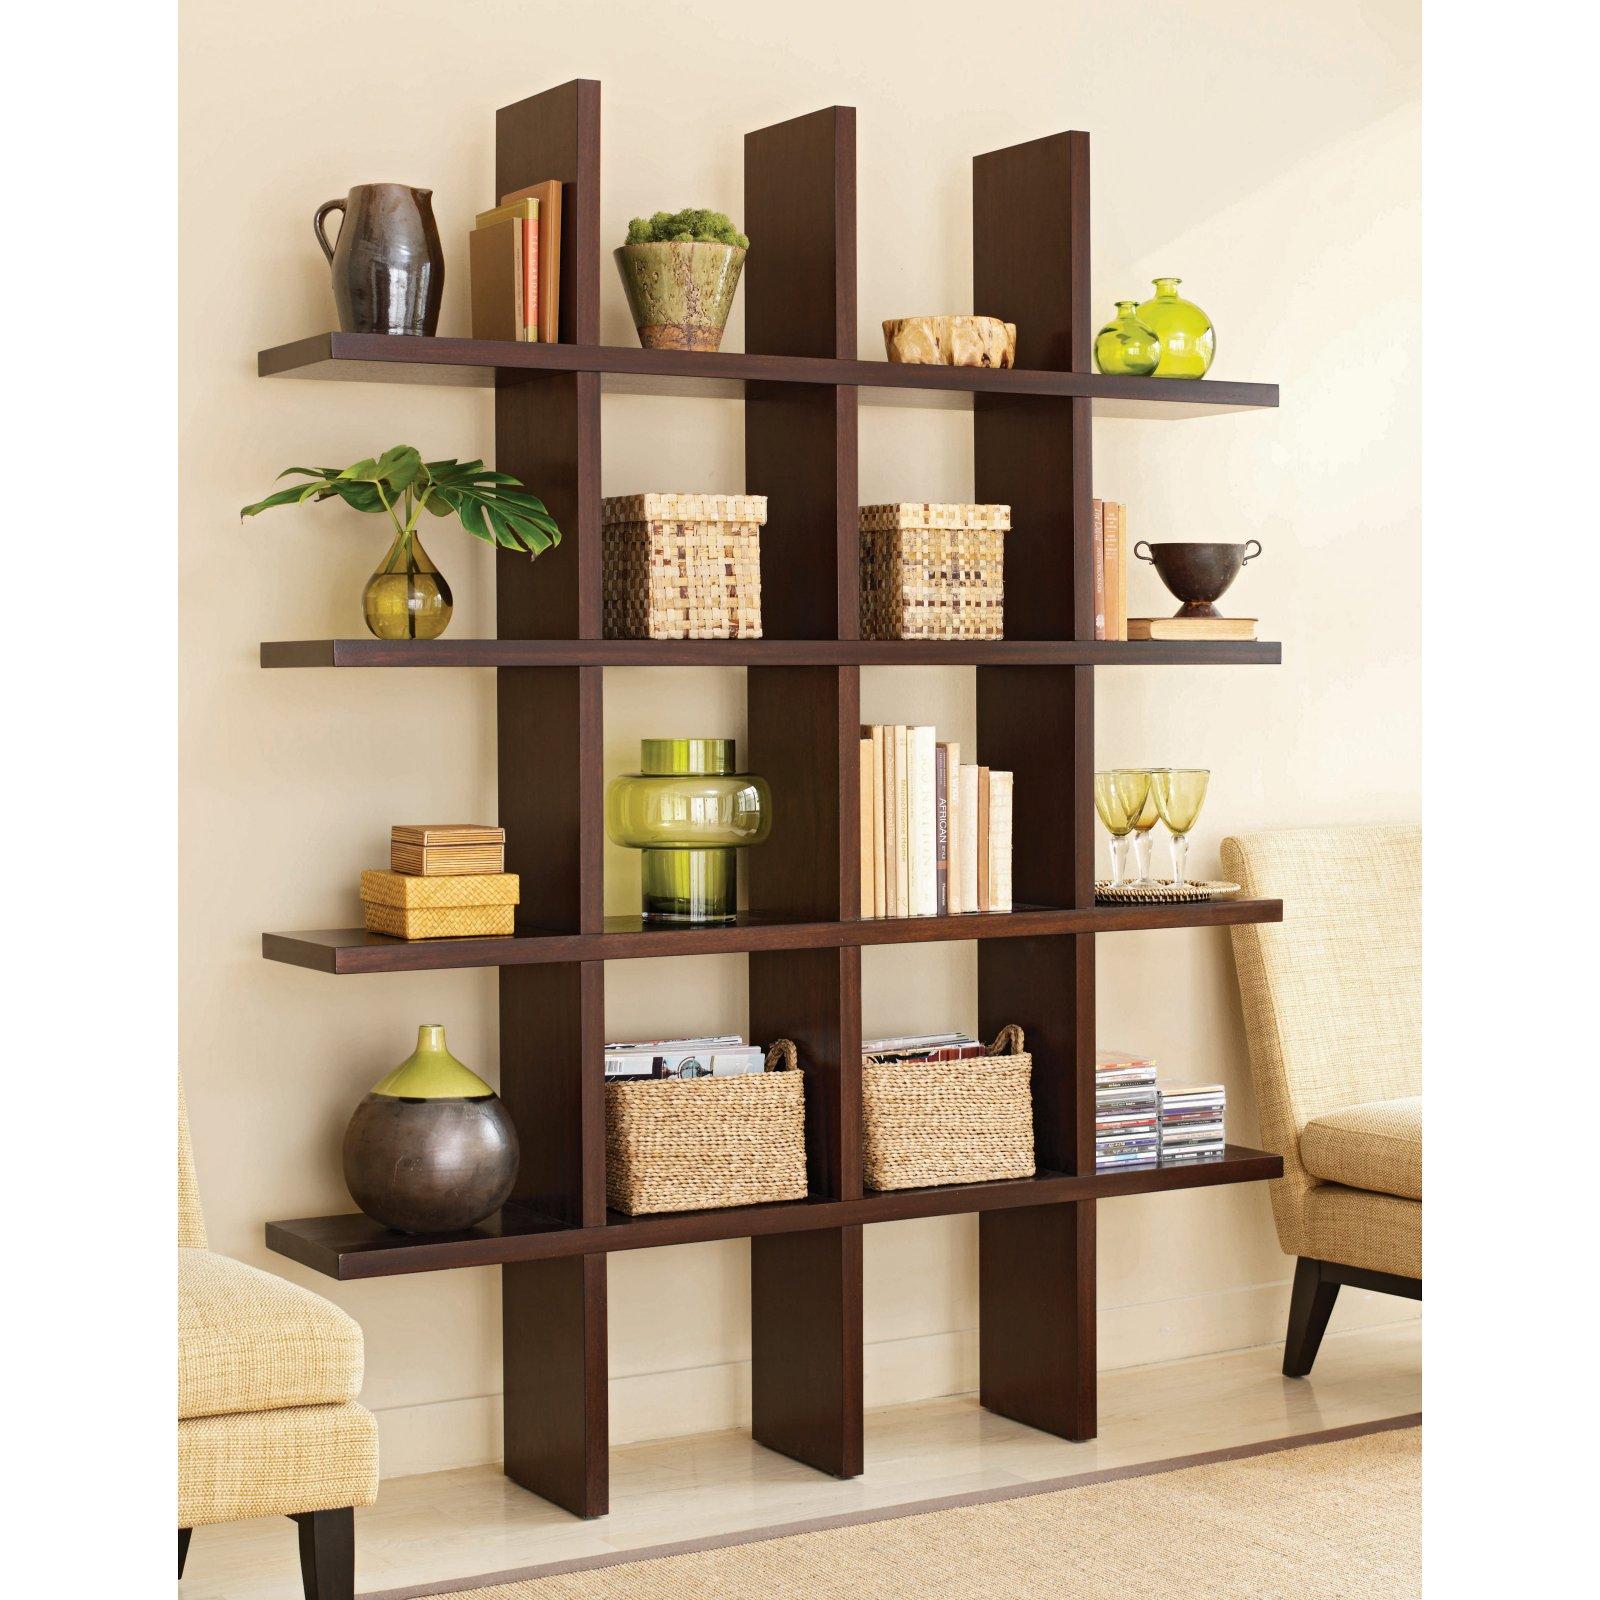 1600x1600px 10 Good Designer Bookshelves Picture in Furniture